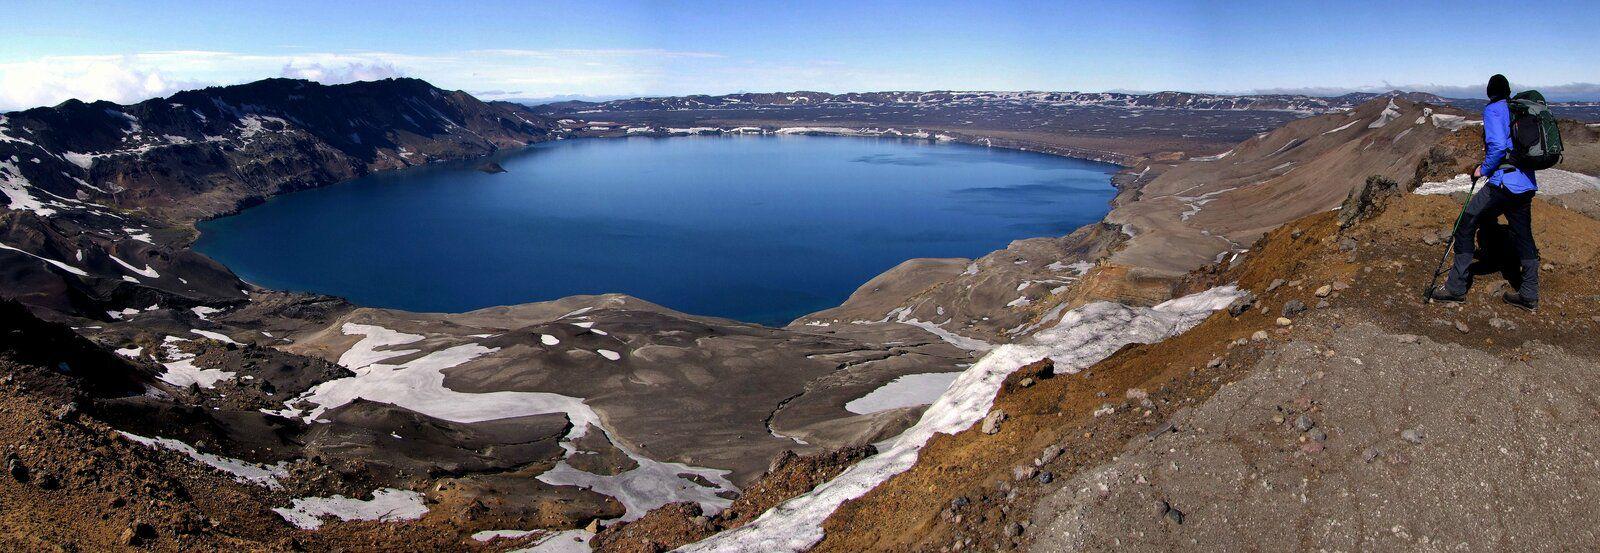 Askja - Lake Öskjuvatn (4-5 km) fills the caldera of the 1875 eruption - photo Dave McGarvie 2010-2011 - one click to enlarge